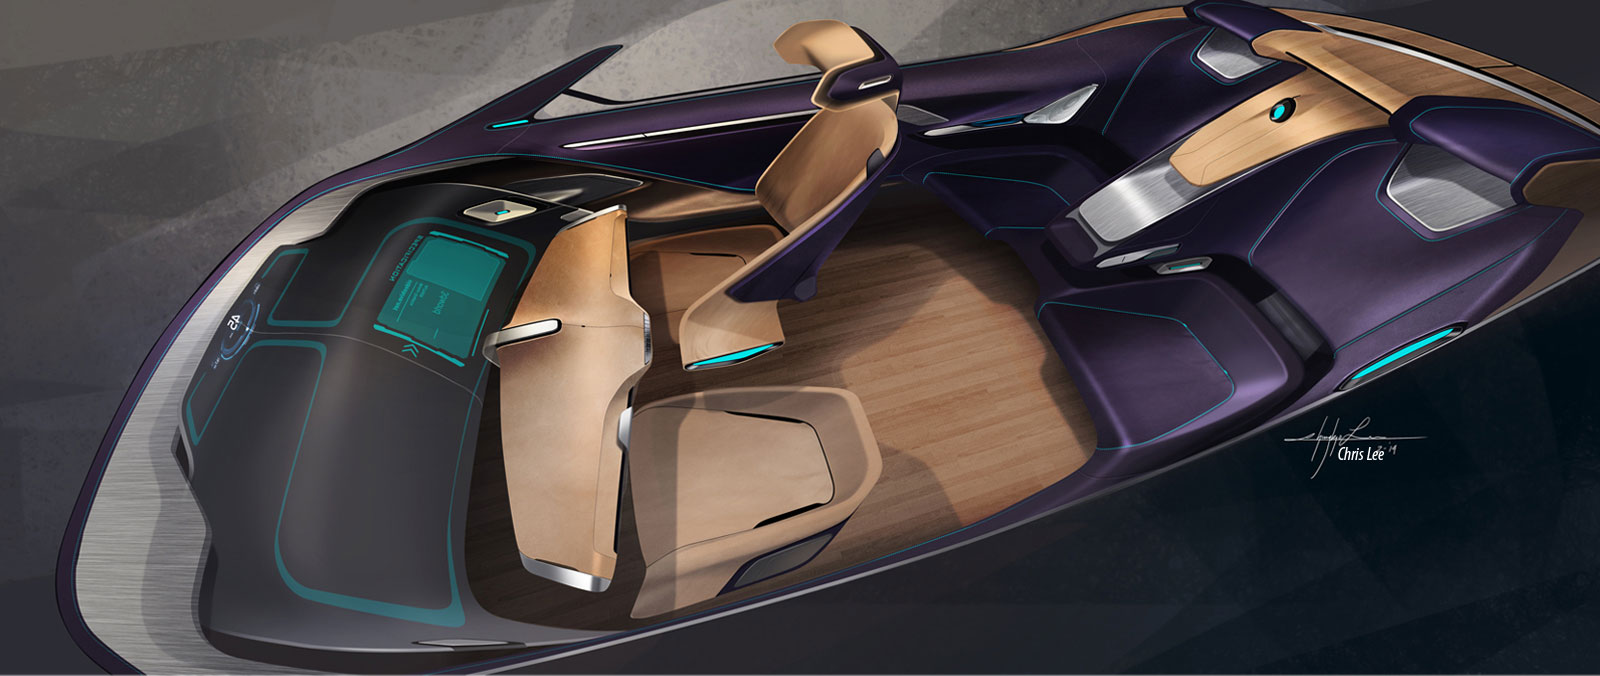 bmw i7 concept interior design sketch car body design. Black Bedroom Furniture Sets. Home Design Ideas